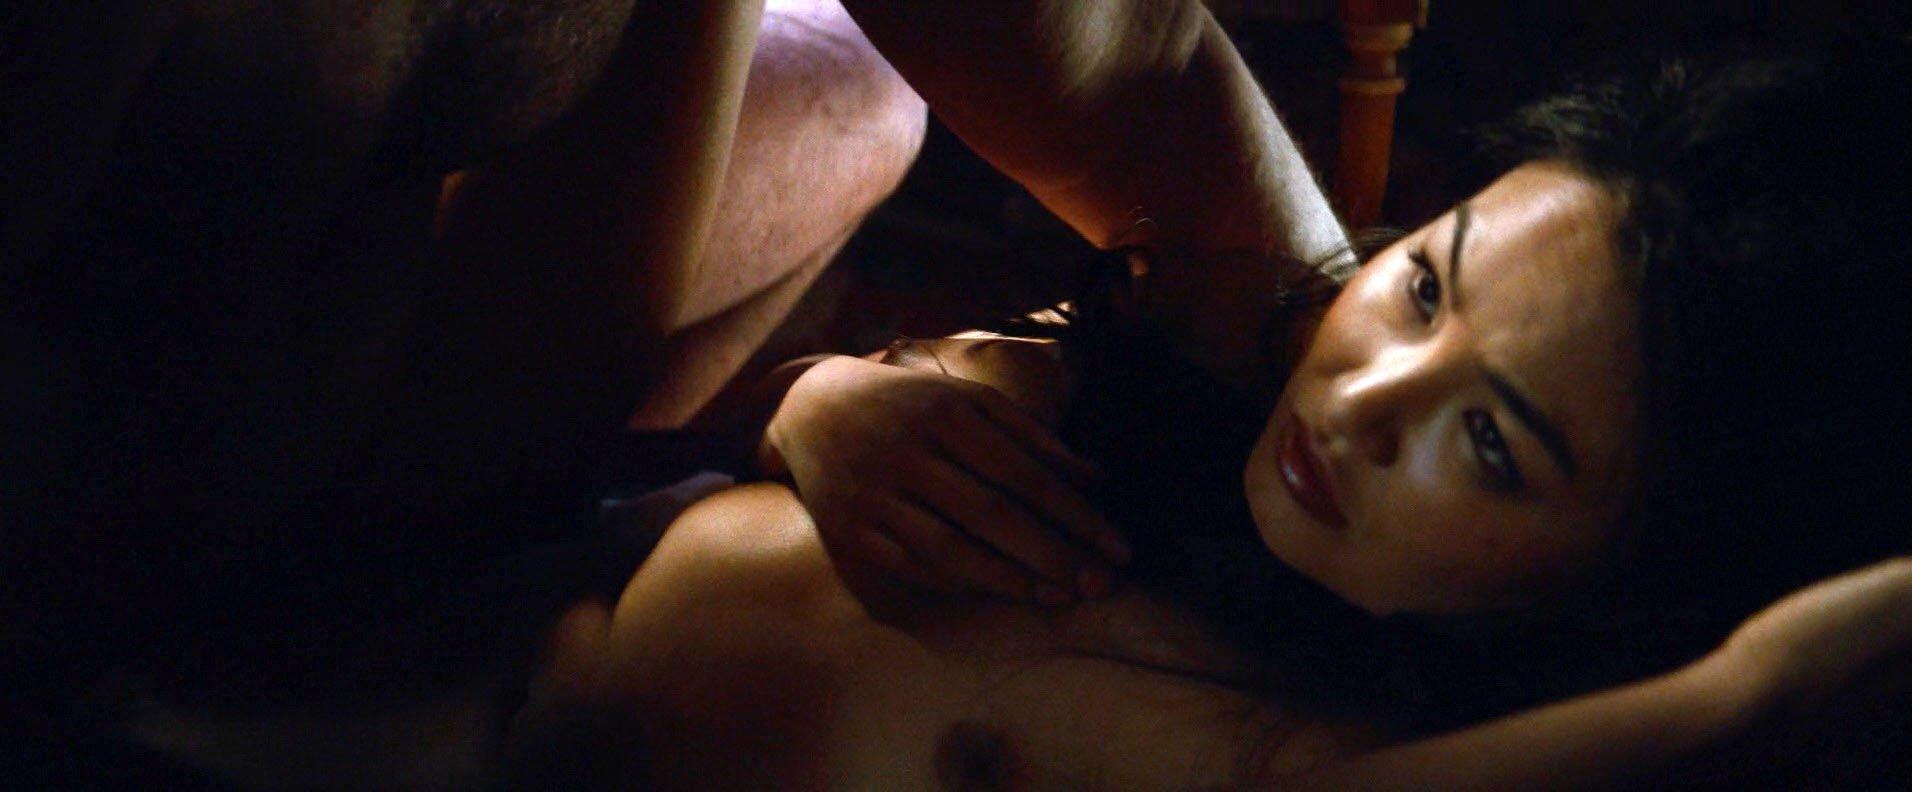 Rosario dawson full frontal in trance hd - 3 part 4